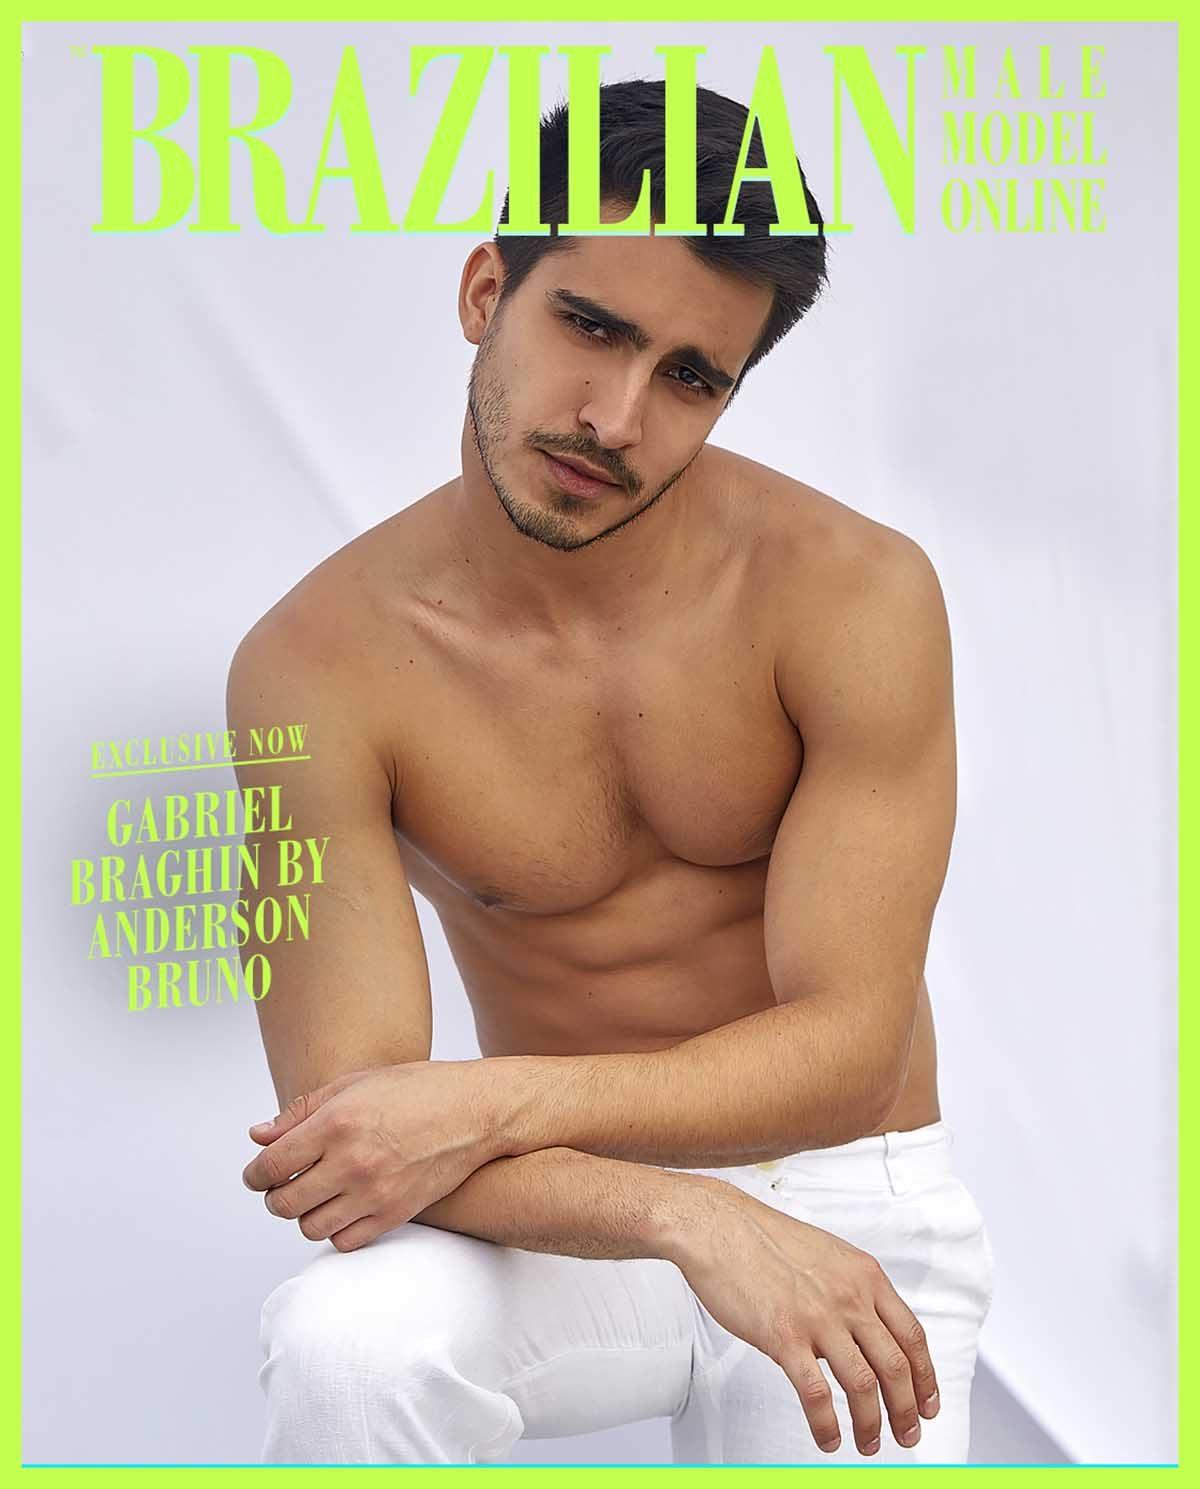 Gabriel Braghin by Anderson Bruno